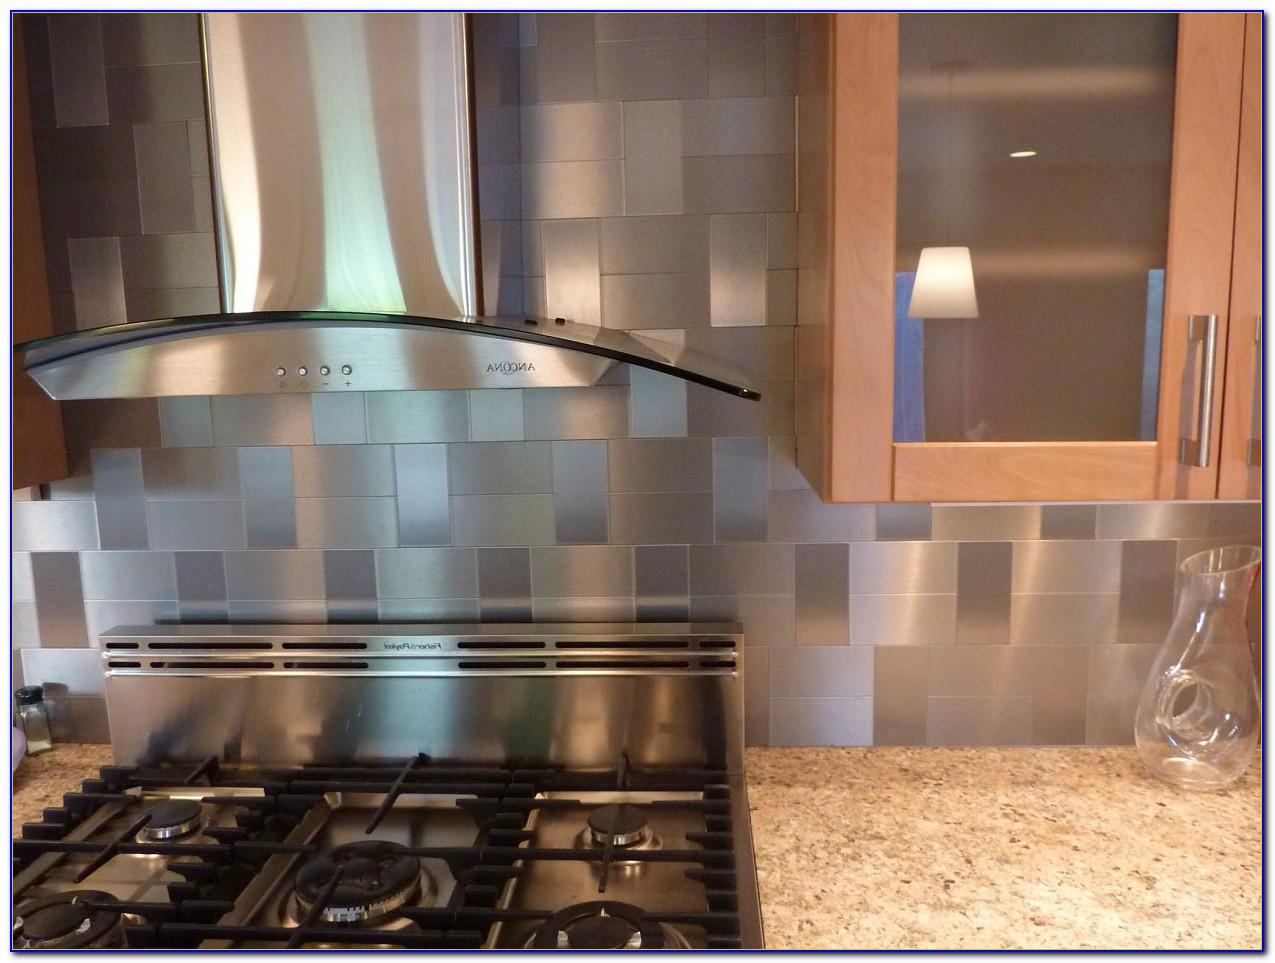 stick on backsplash tiles for kitchen bar stools ikea metallic tile home design